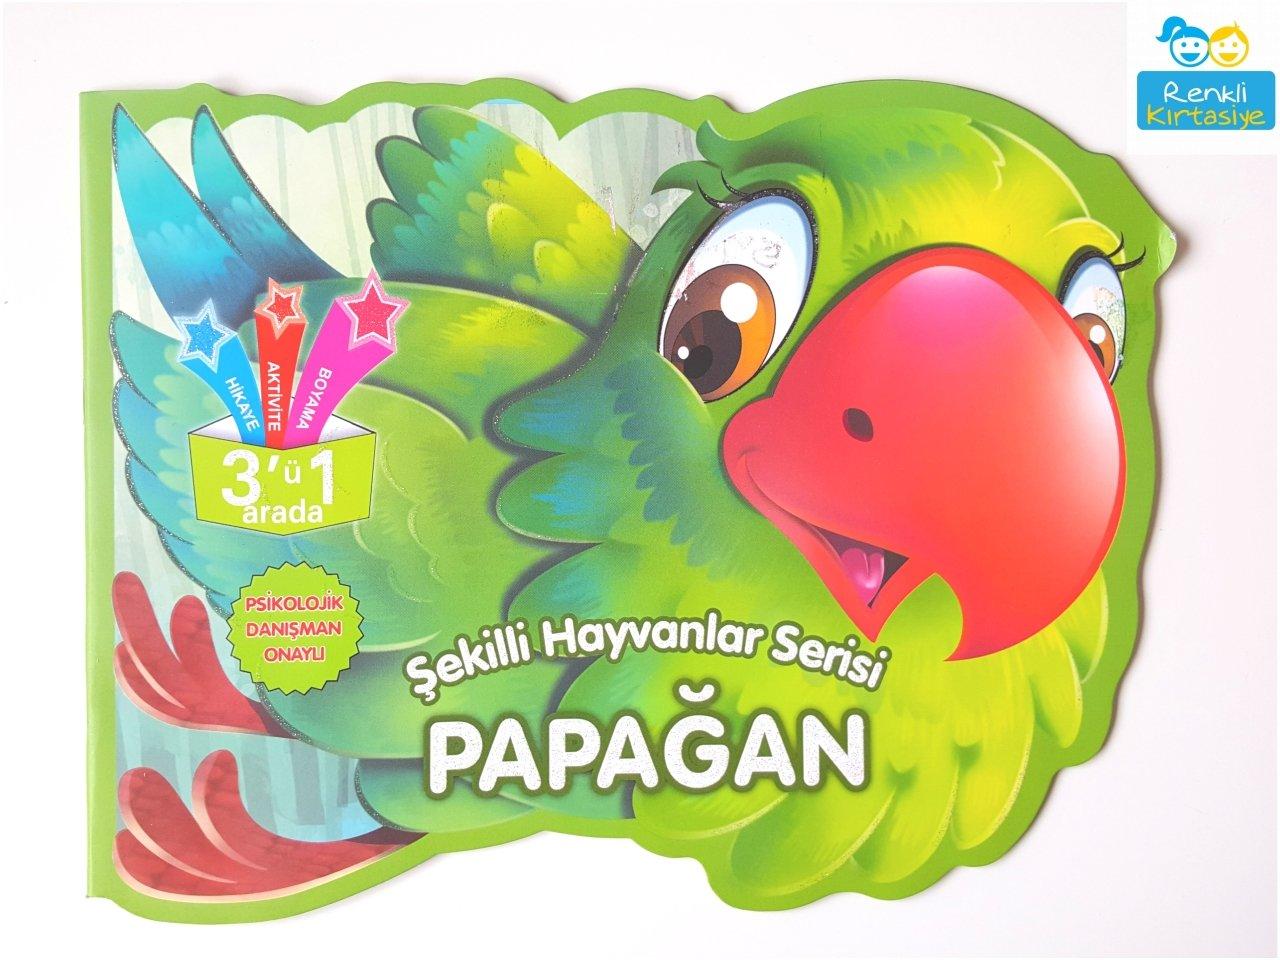 Sekilli Hayvanlar Serisi Papagan 3 U 1 Arada Aktivite Kitabi